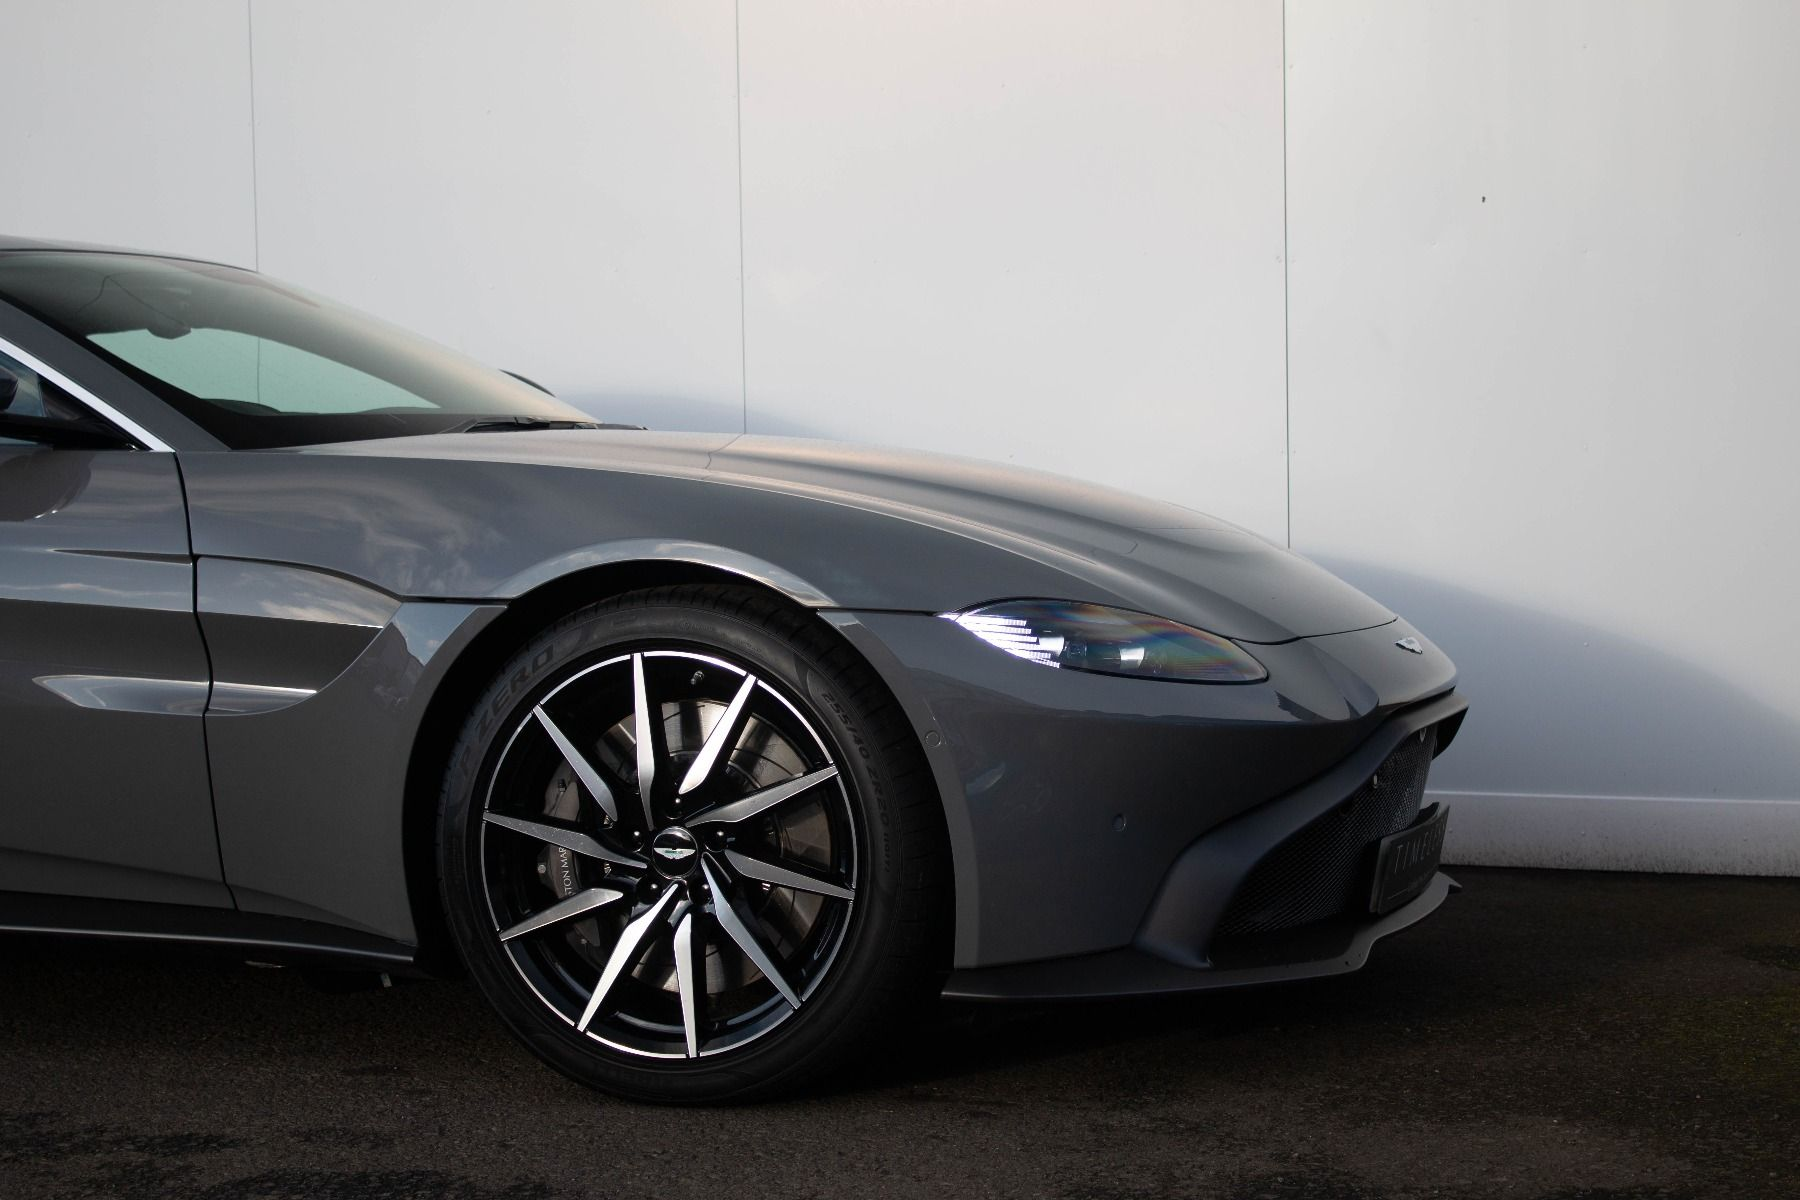 Aston Martin V8 Vantage Coupe 2dr ZF 8 Speed image 5